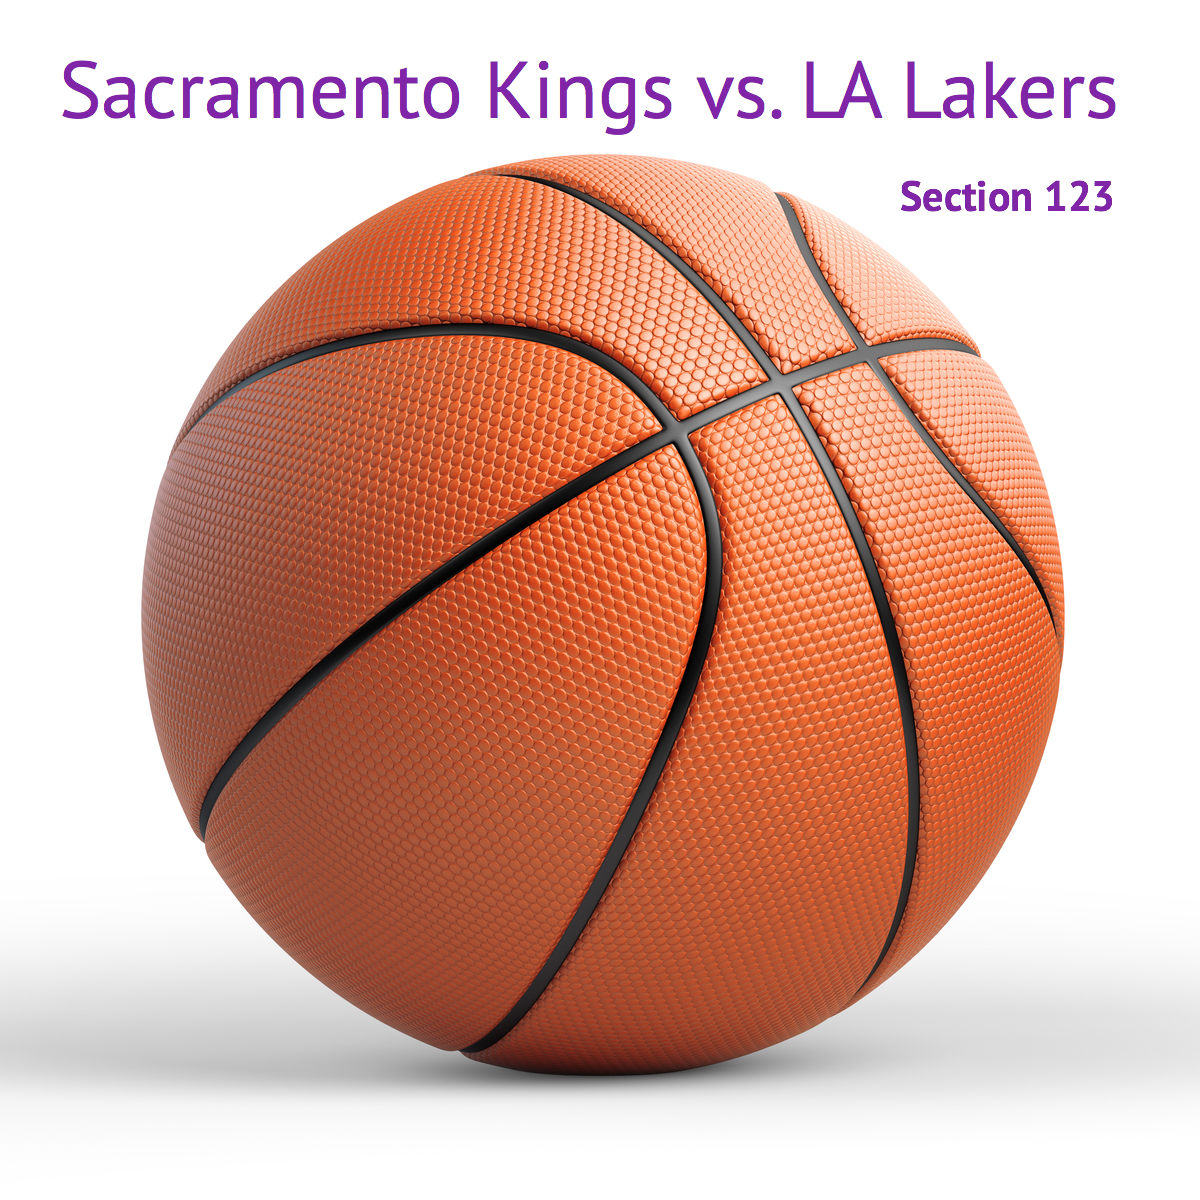 Kings-vs-Lakers1